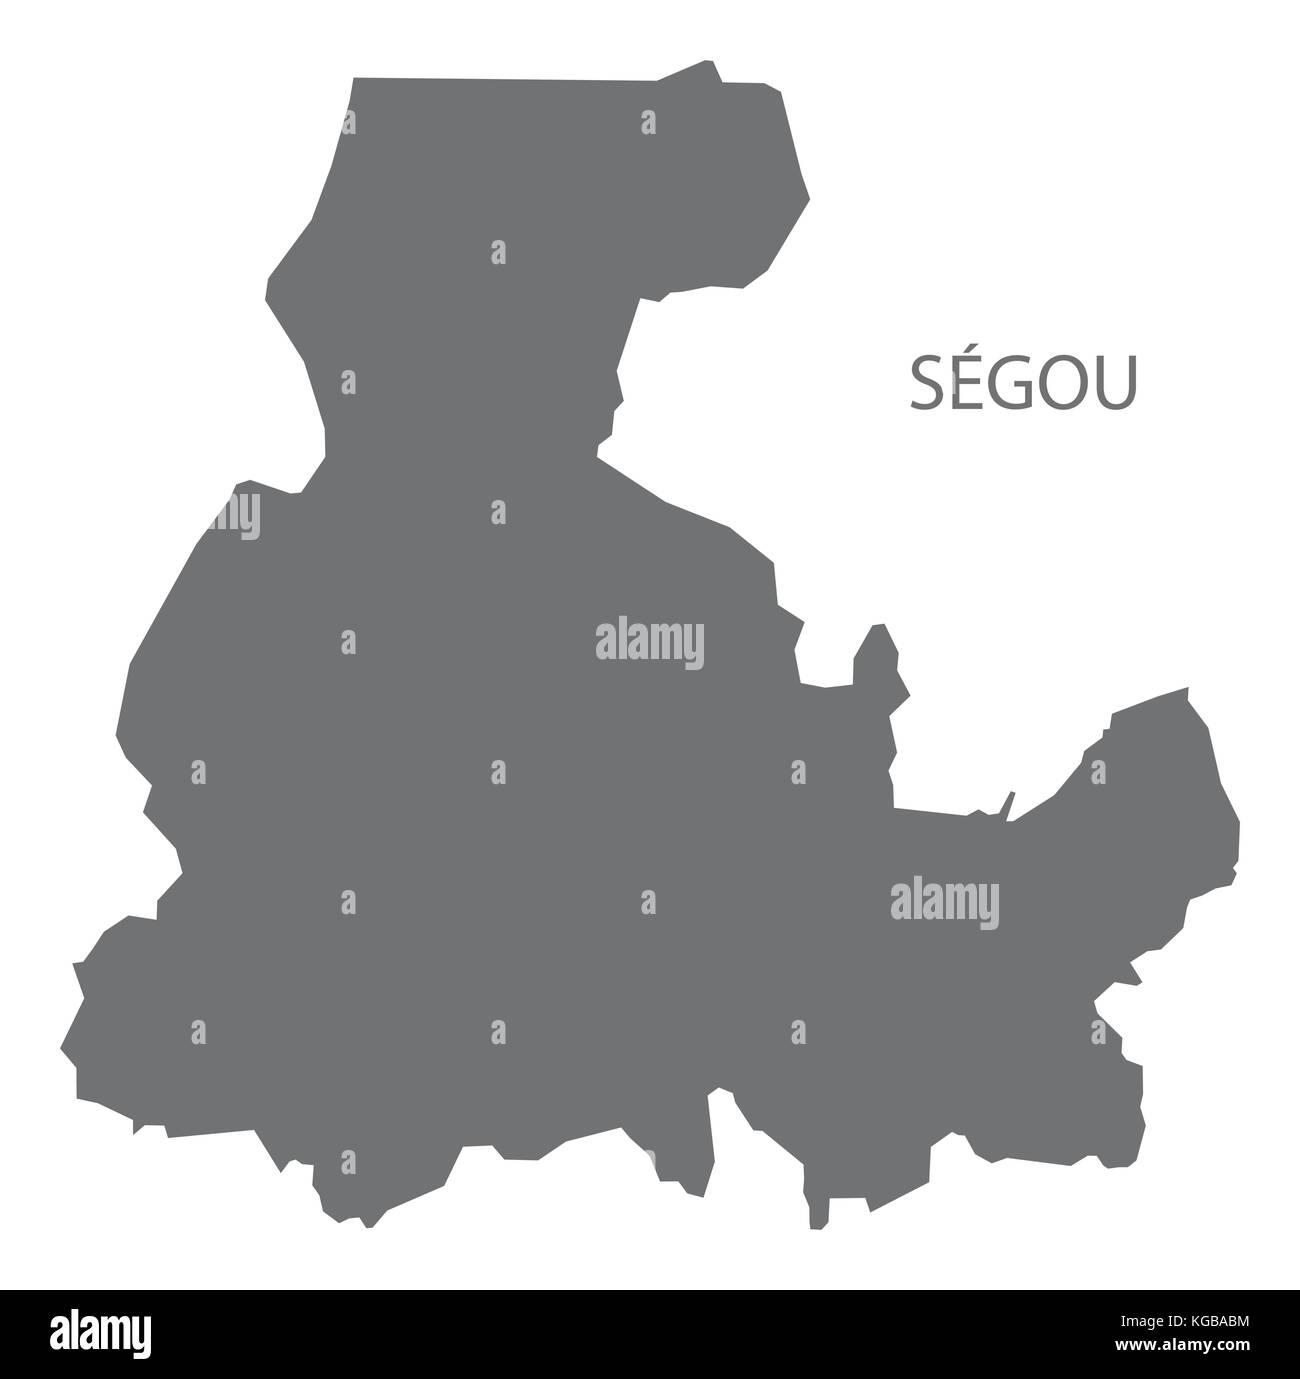 Segou region map of Mali grey illustration silhouette shape Stock